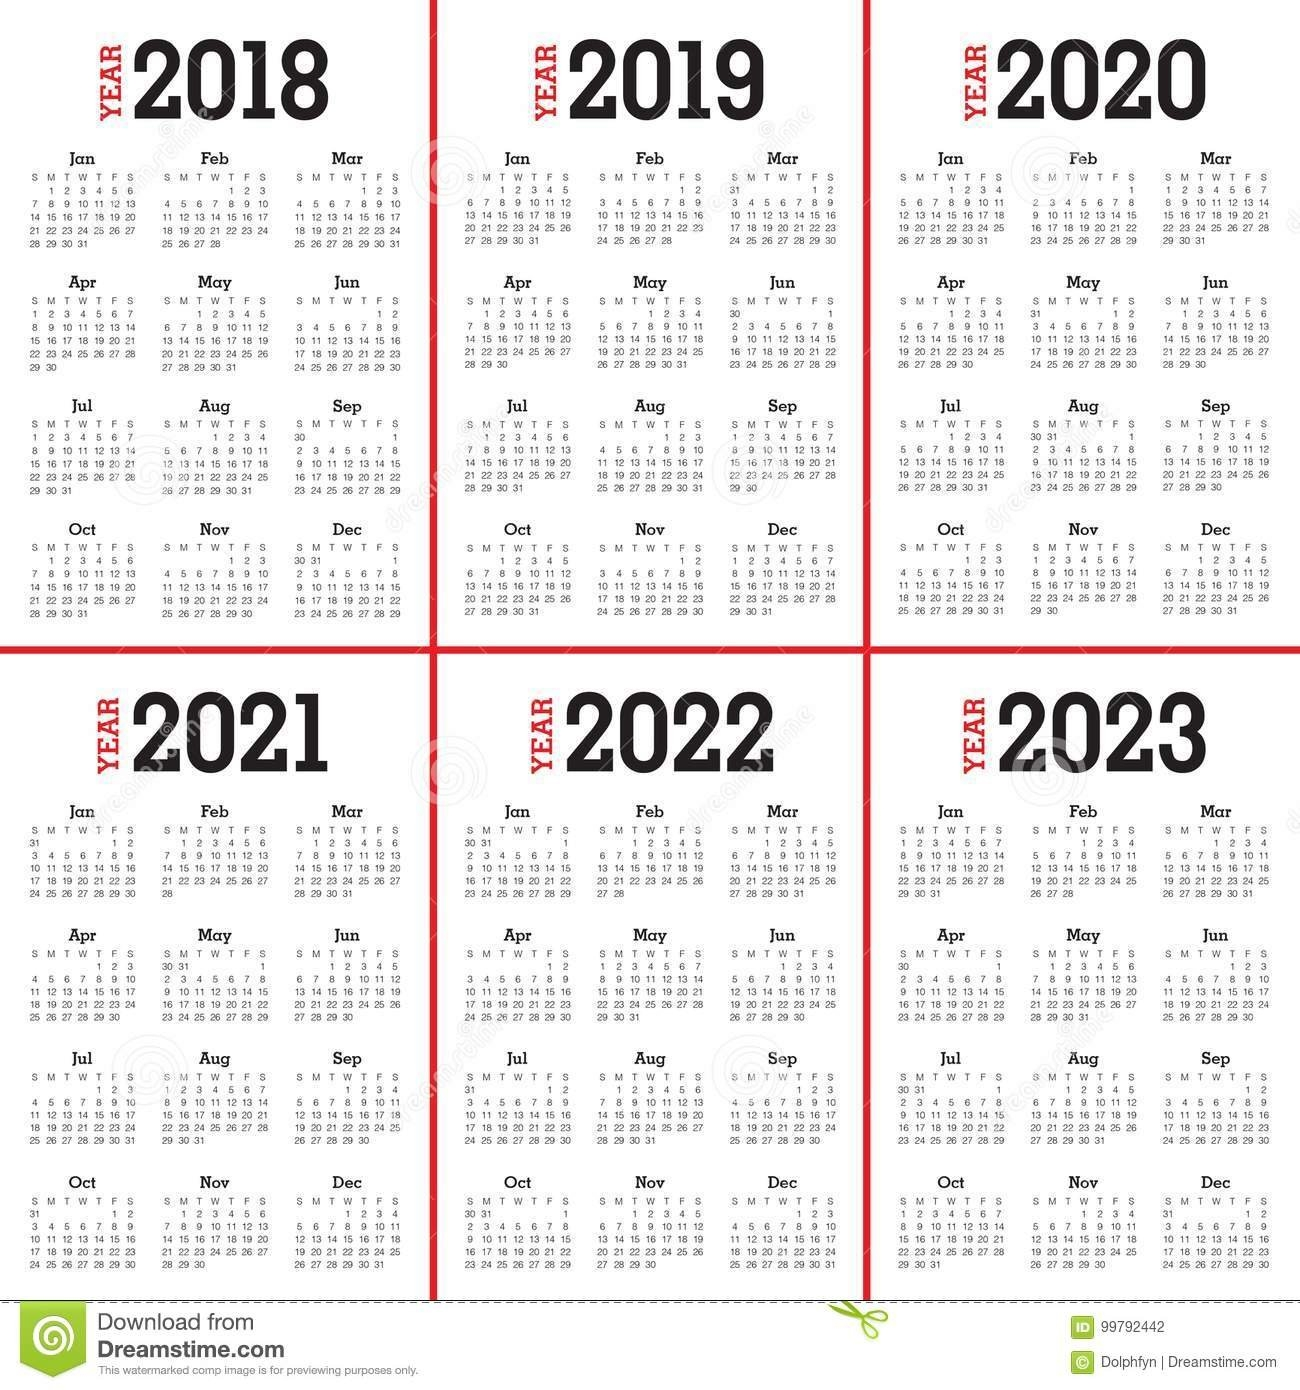 Six Year Calendar 2018 2019 2020 2021 2022 And 2023. Editorial 3 Year Calendar 2019